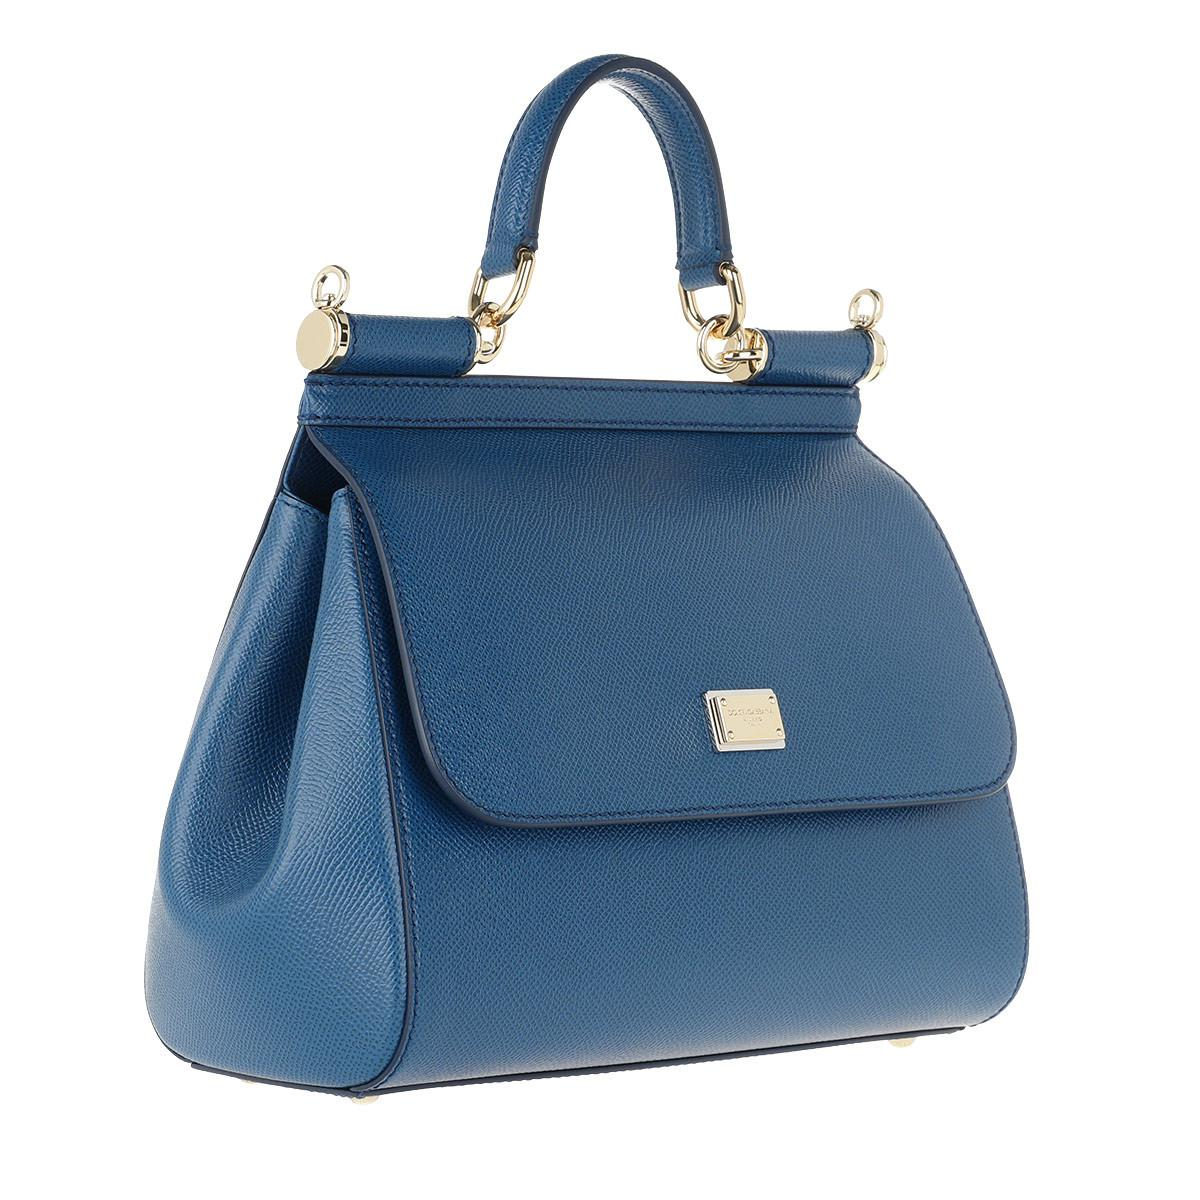 38bd67ccf9 Dolce   Gabbana Sicily Saffiano Tote Medium Royal Blue in Blue - Lyst